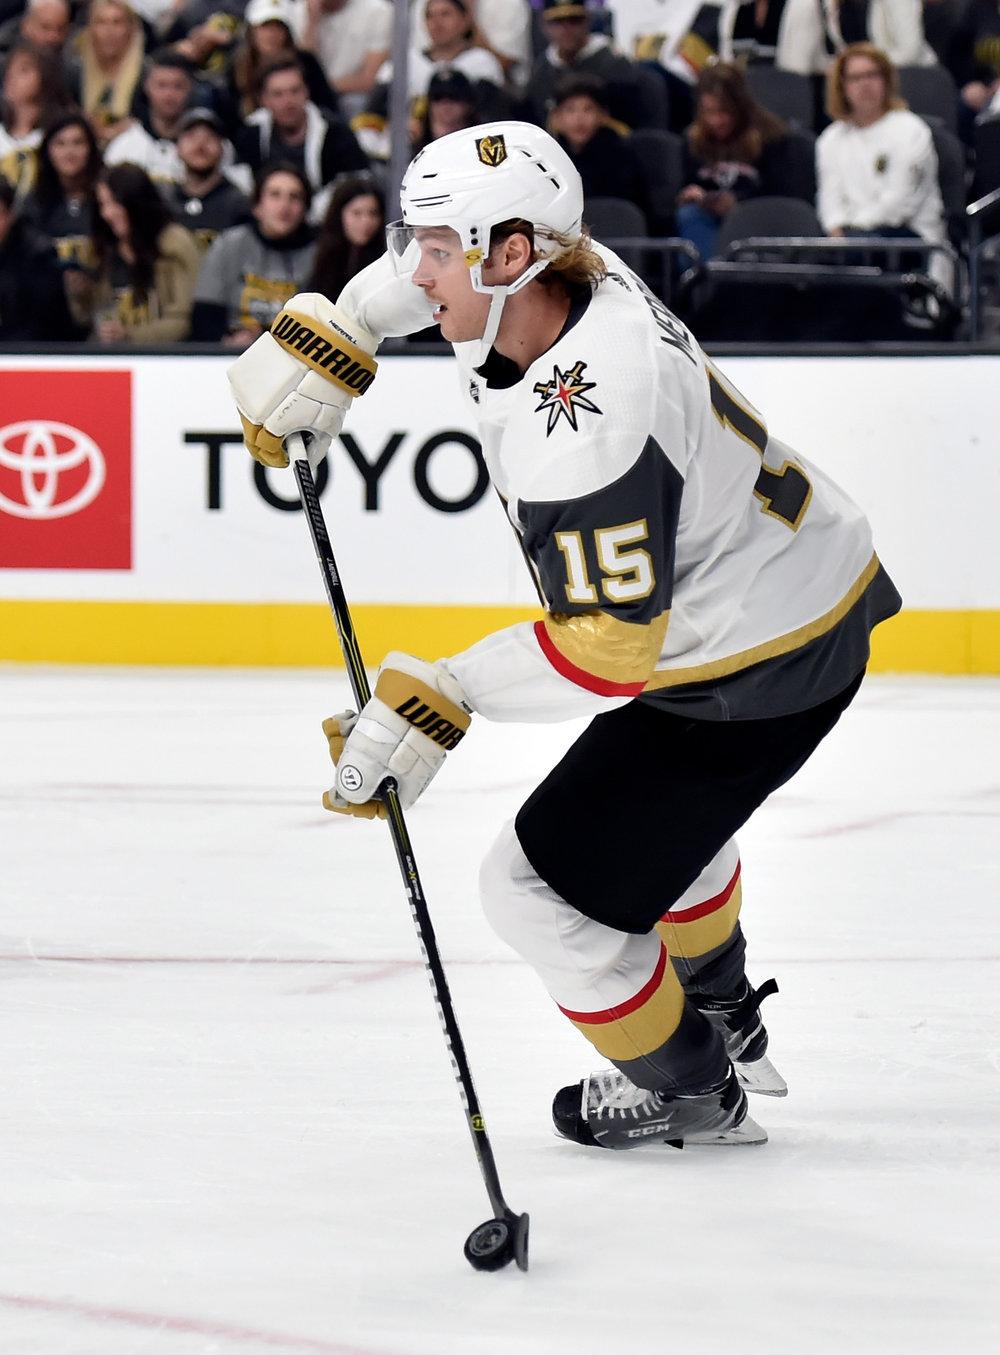 NHL_DB_20181223_2944.jpg